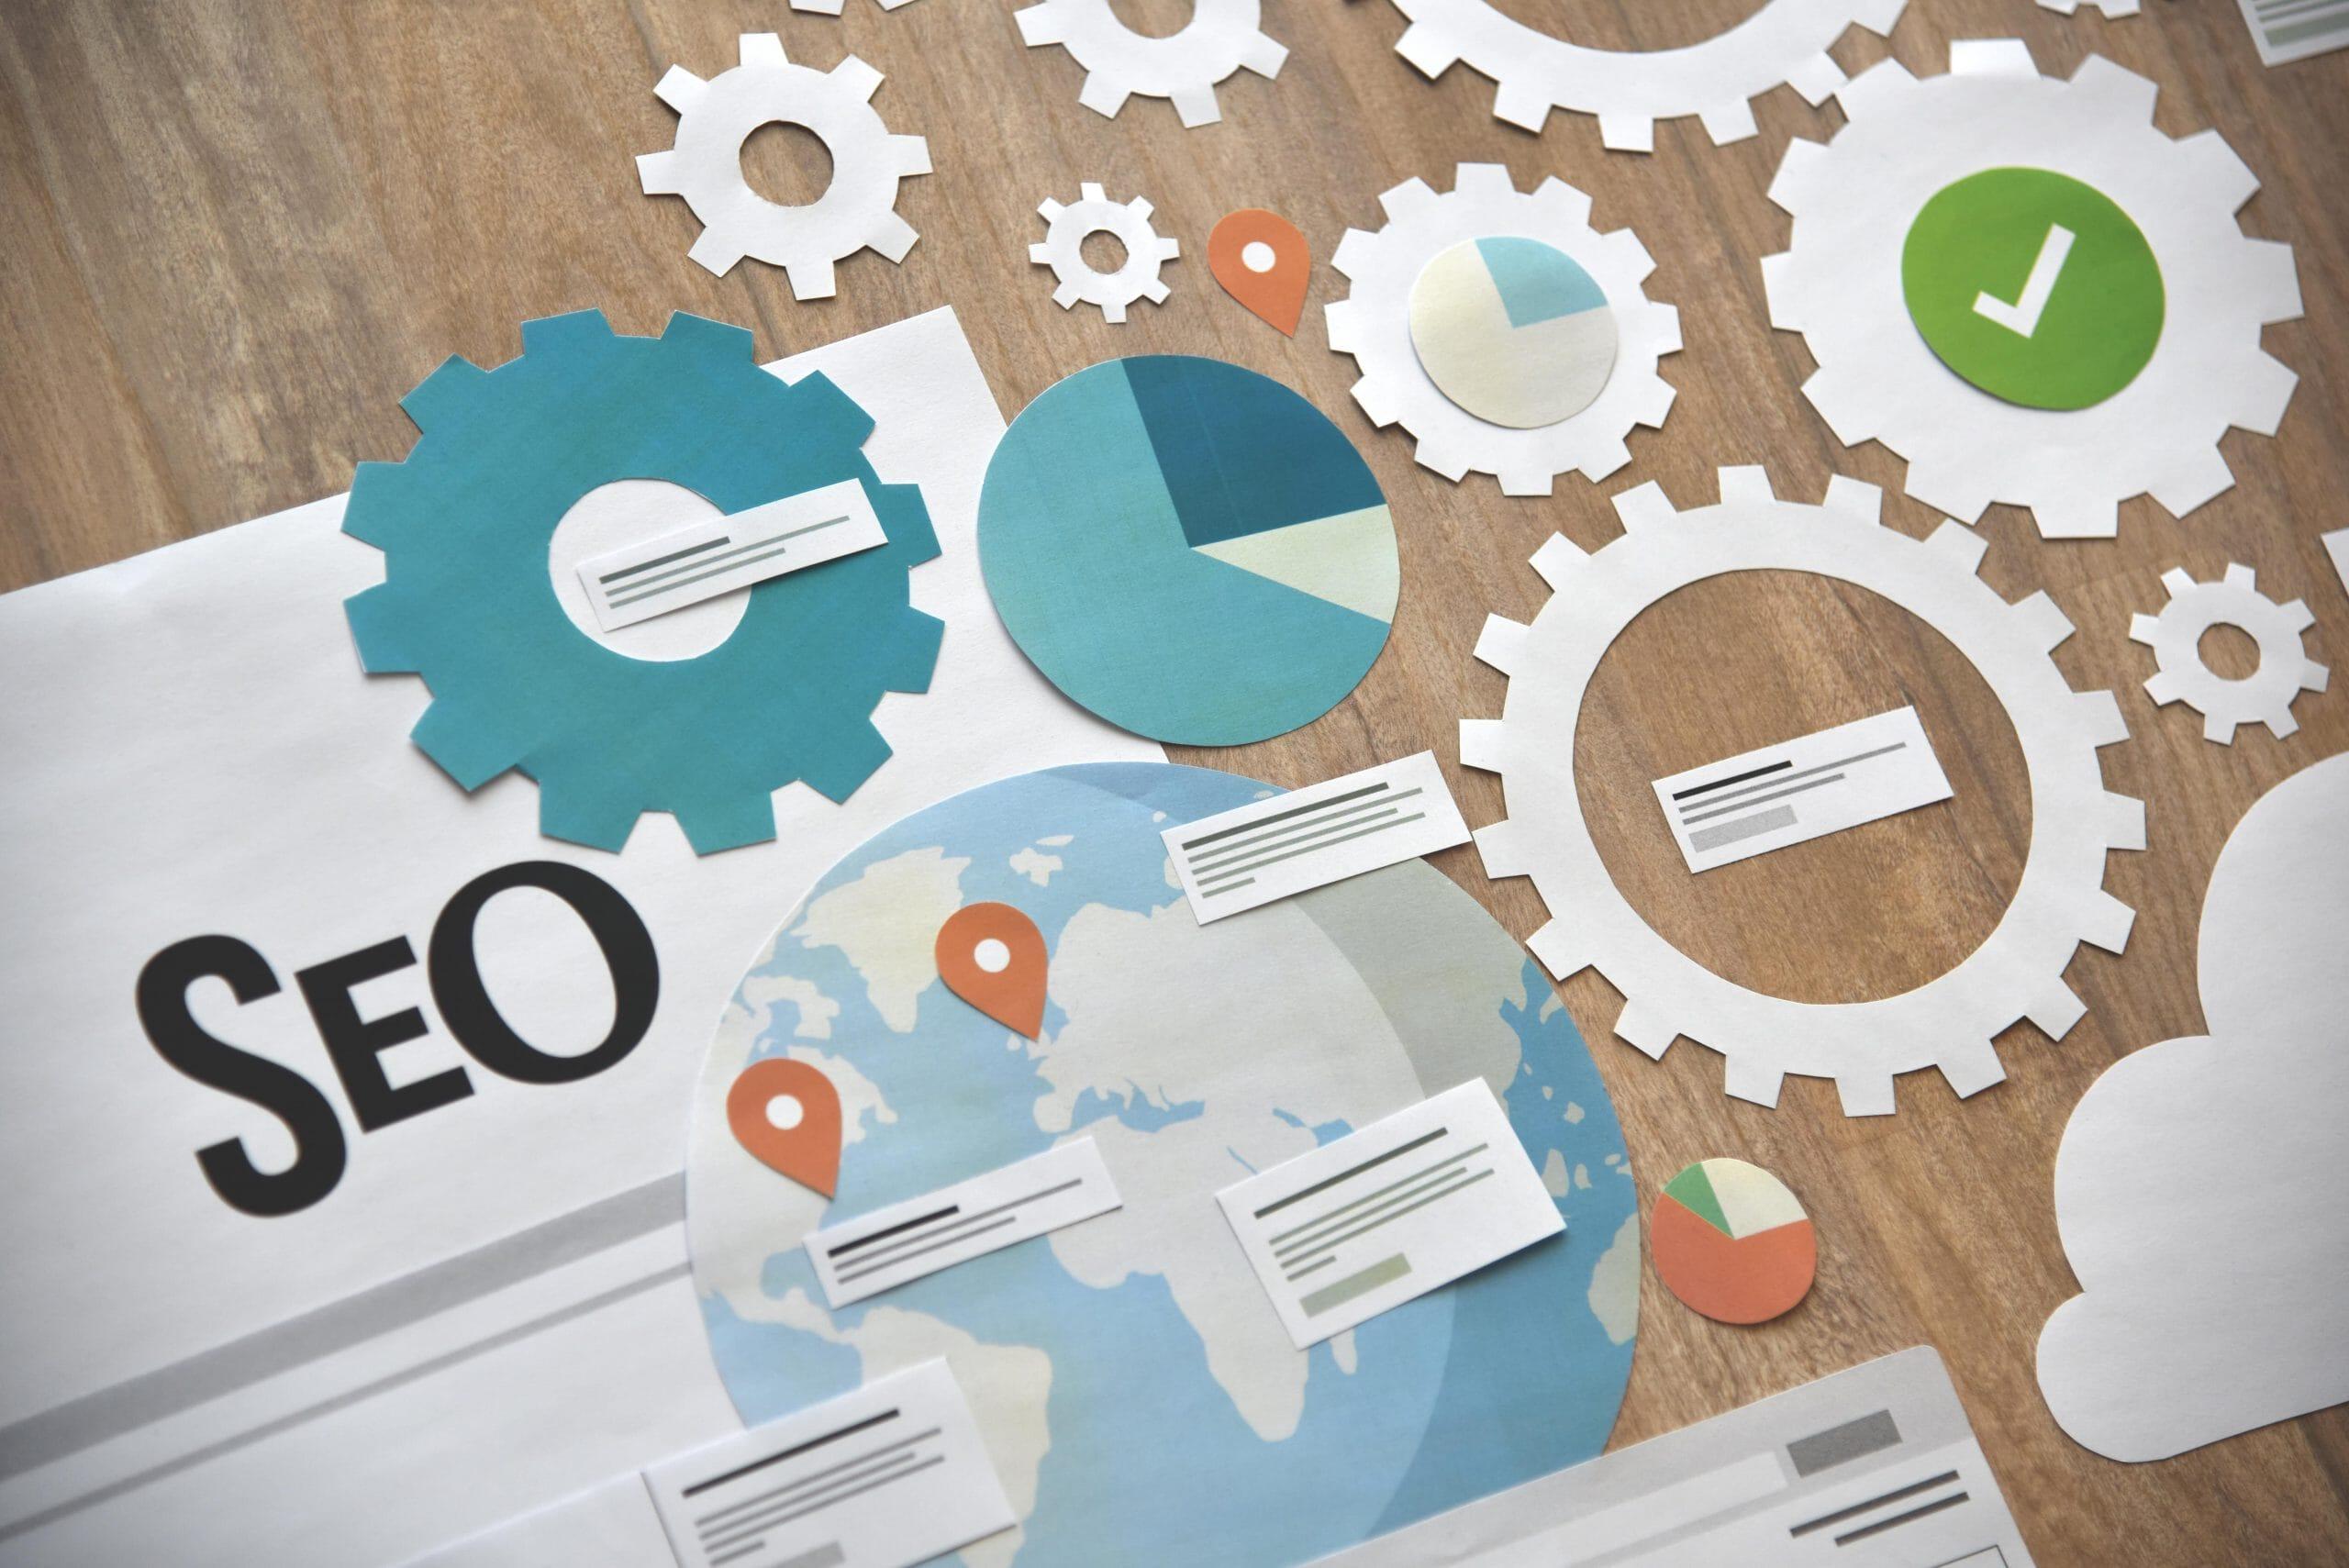 Top 10 blogs to learn Digital Marketing